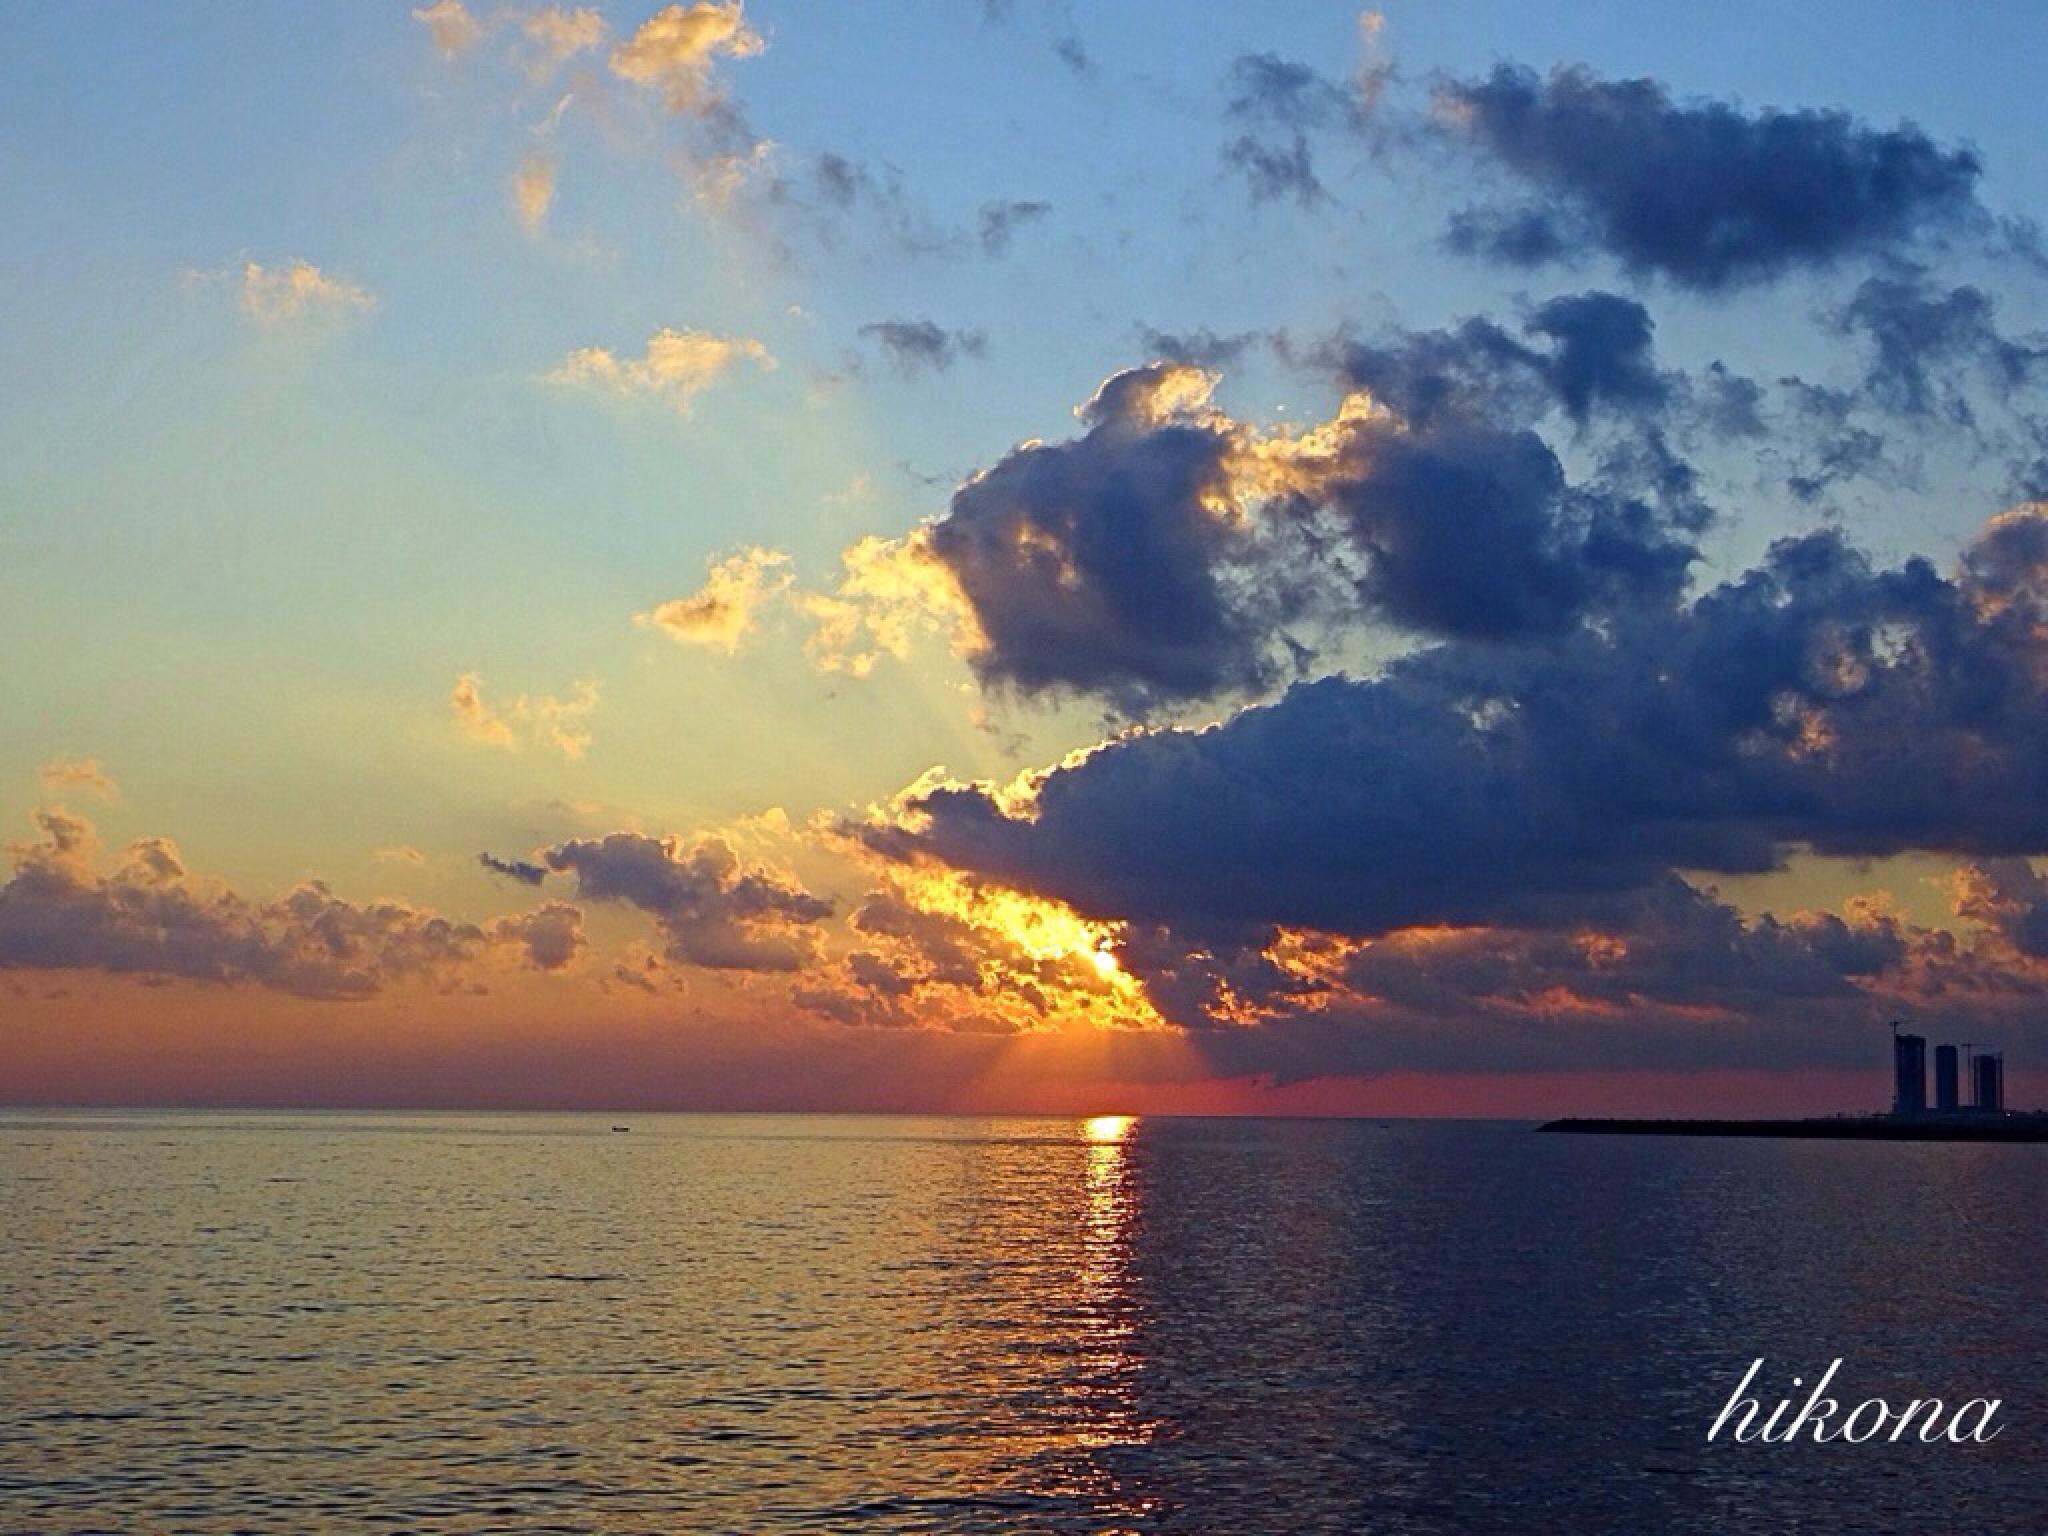 Sun rise  by Hikona